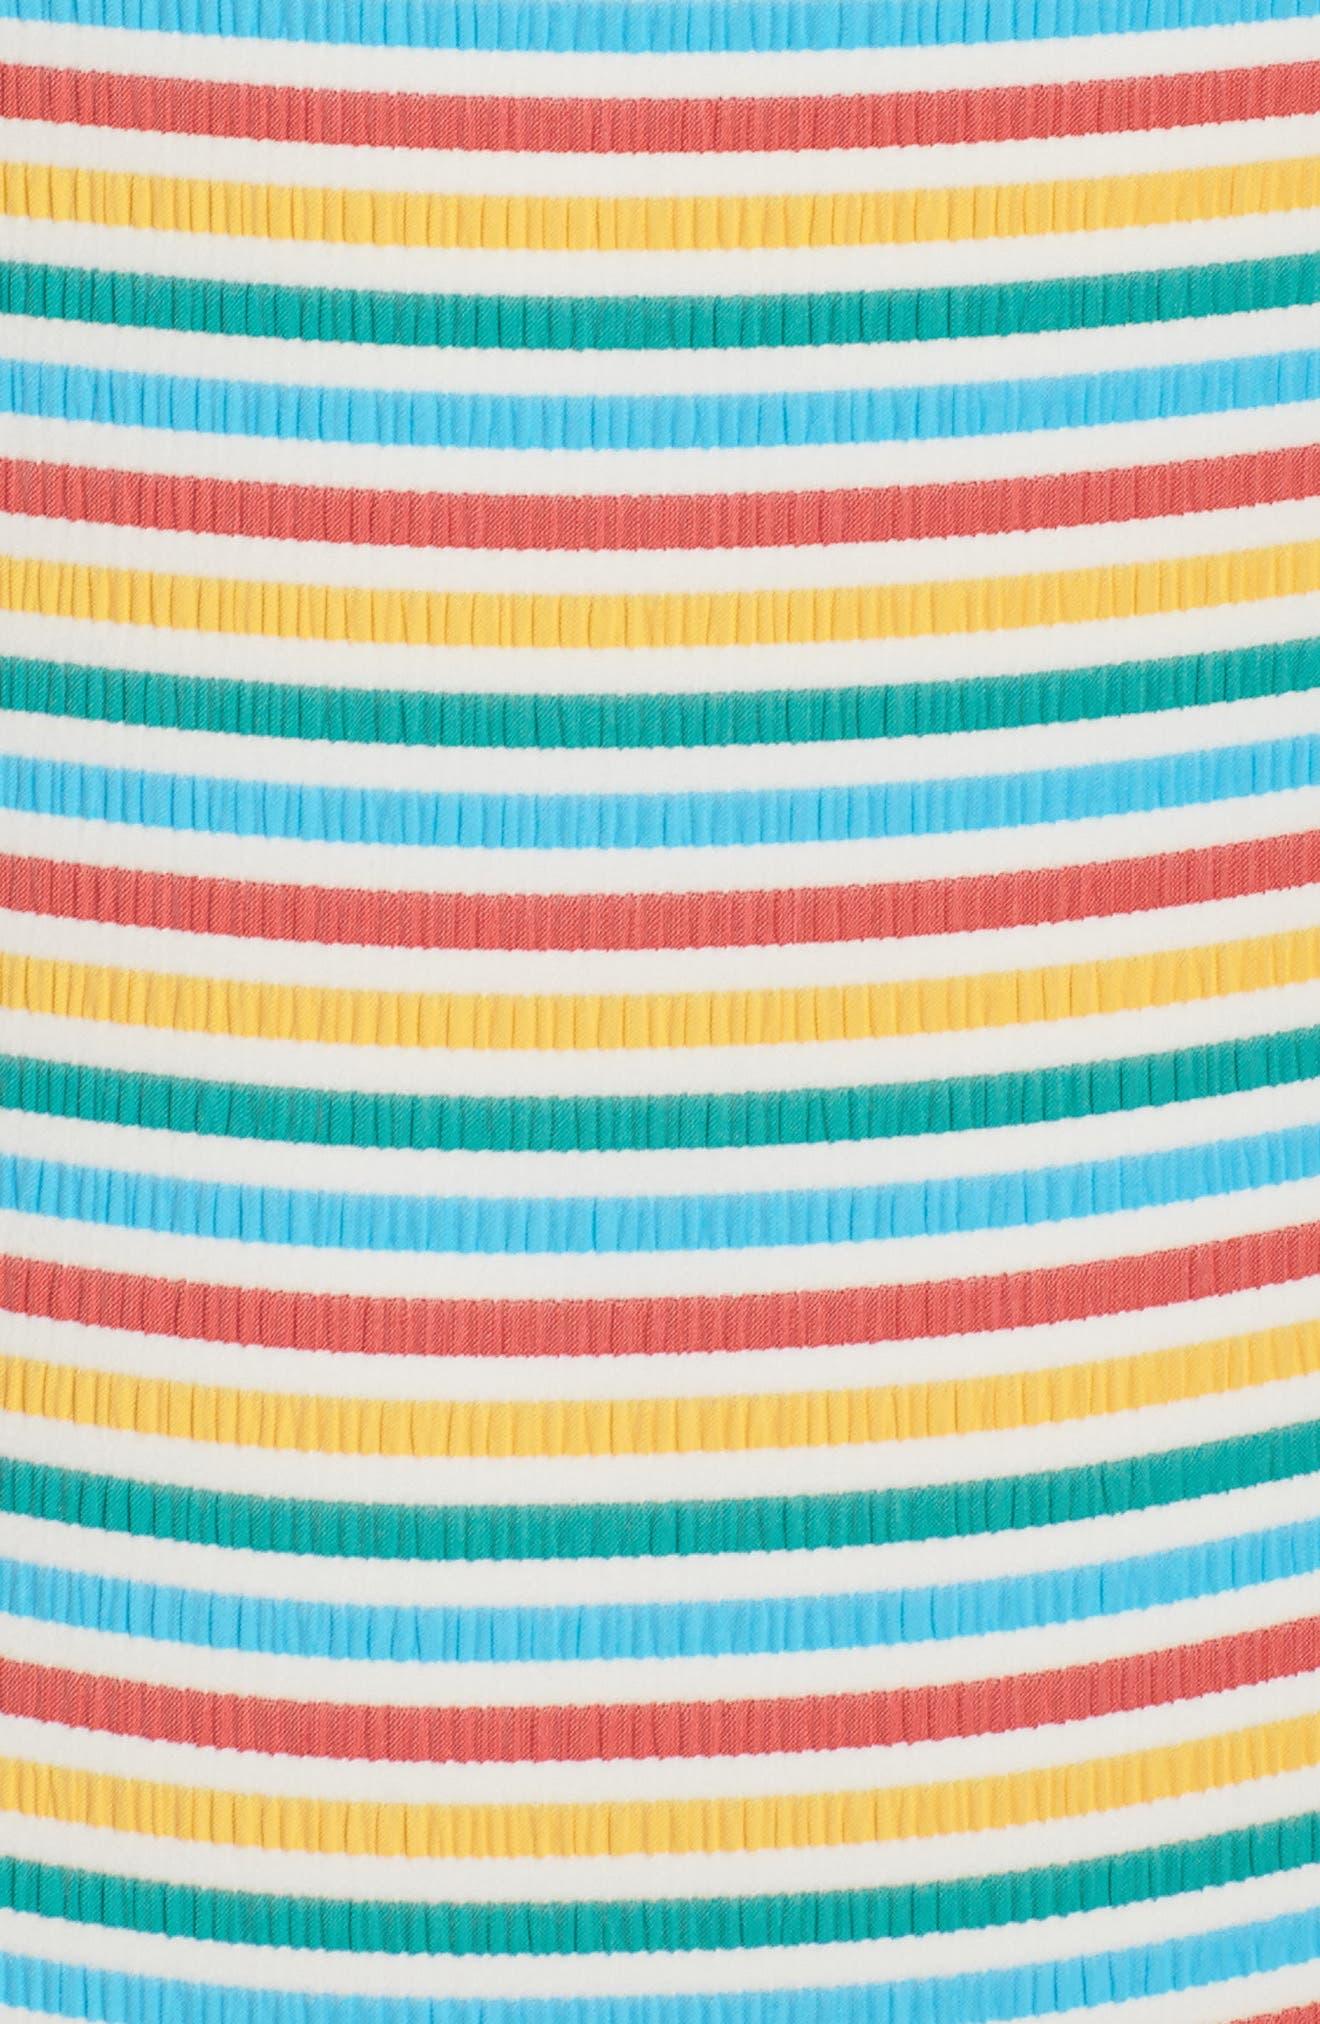 Stripe Low Back One-Piece Swimsuit,                             Alternate thumbnail 5, color,                             700